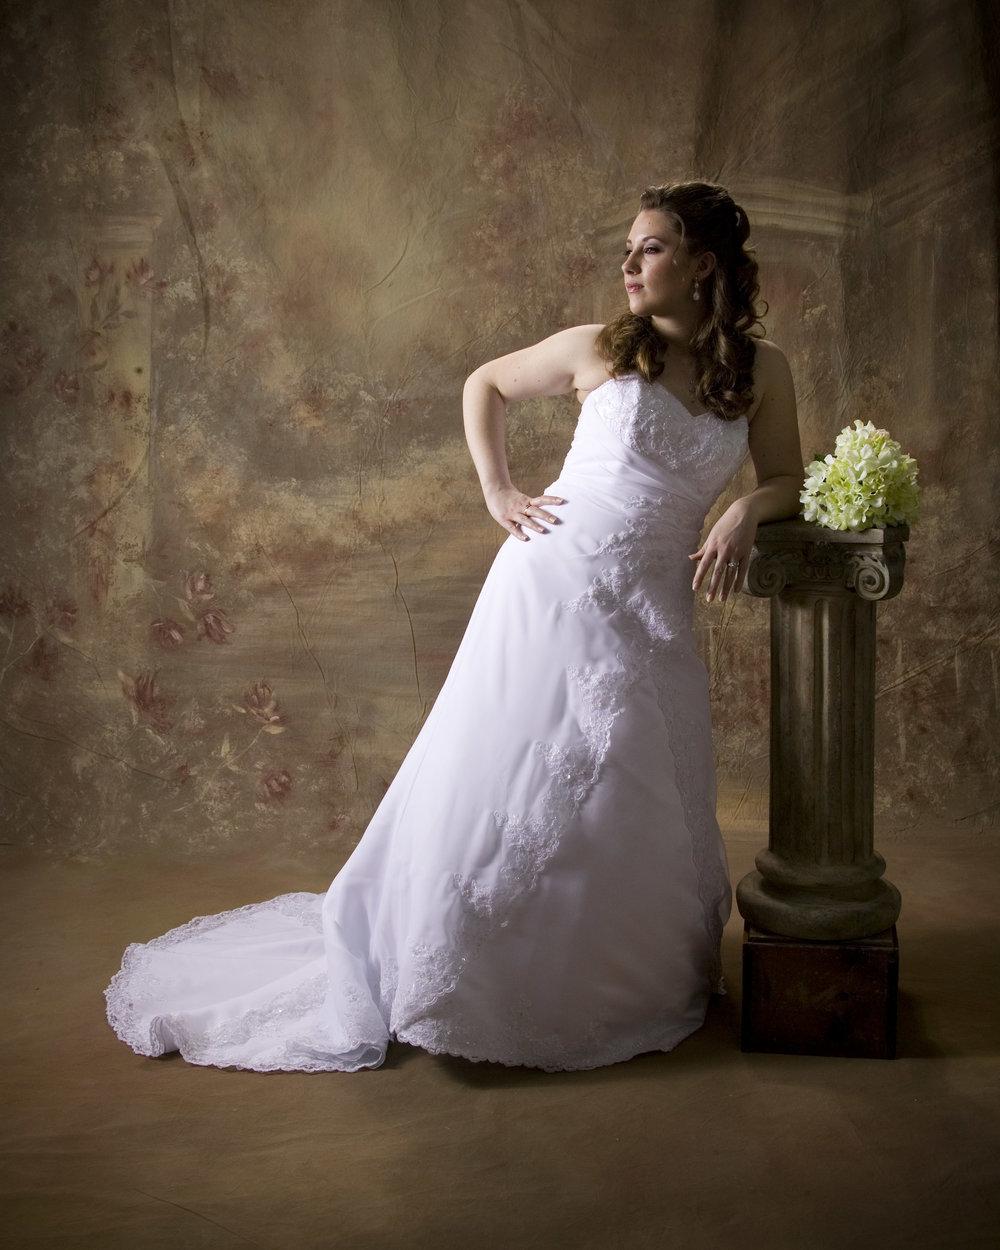 Portrait-Of-Bride-Against-Artistic-Studio-Background.jpg